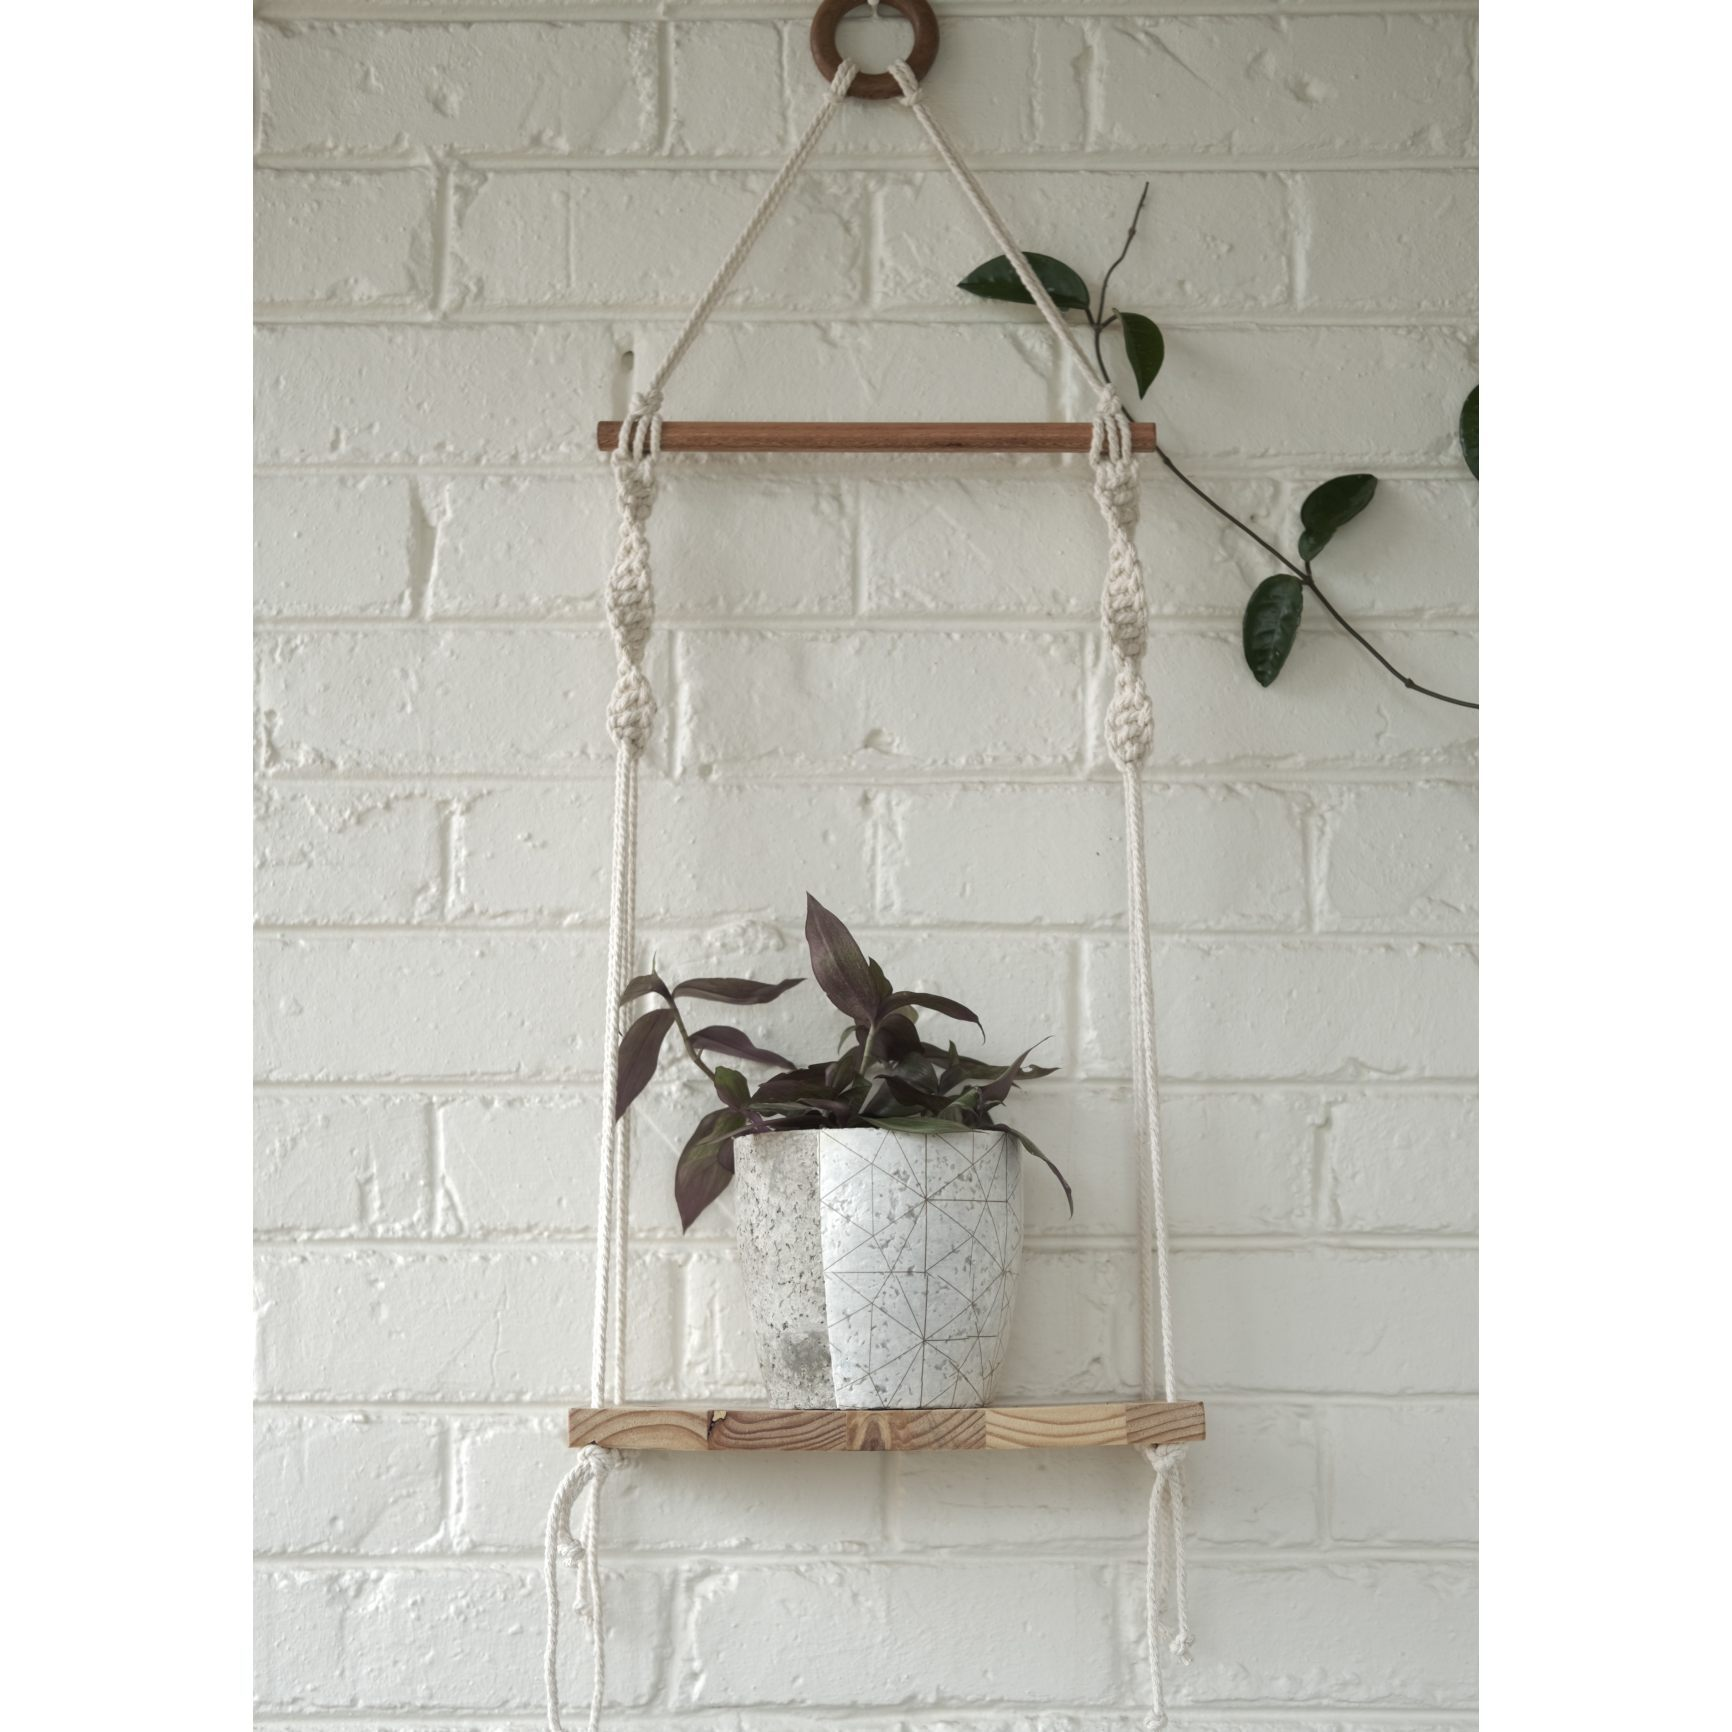 Classic macramé shelf with white geometric plant pot